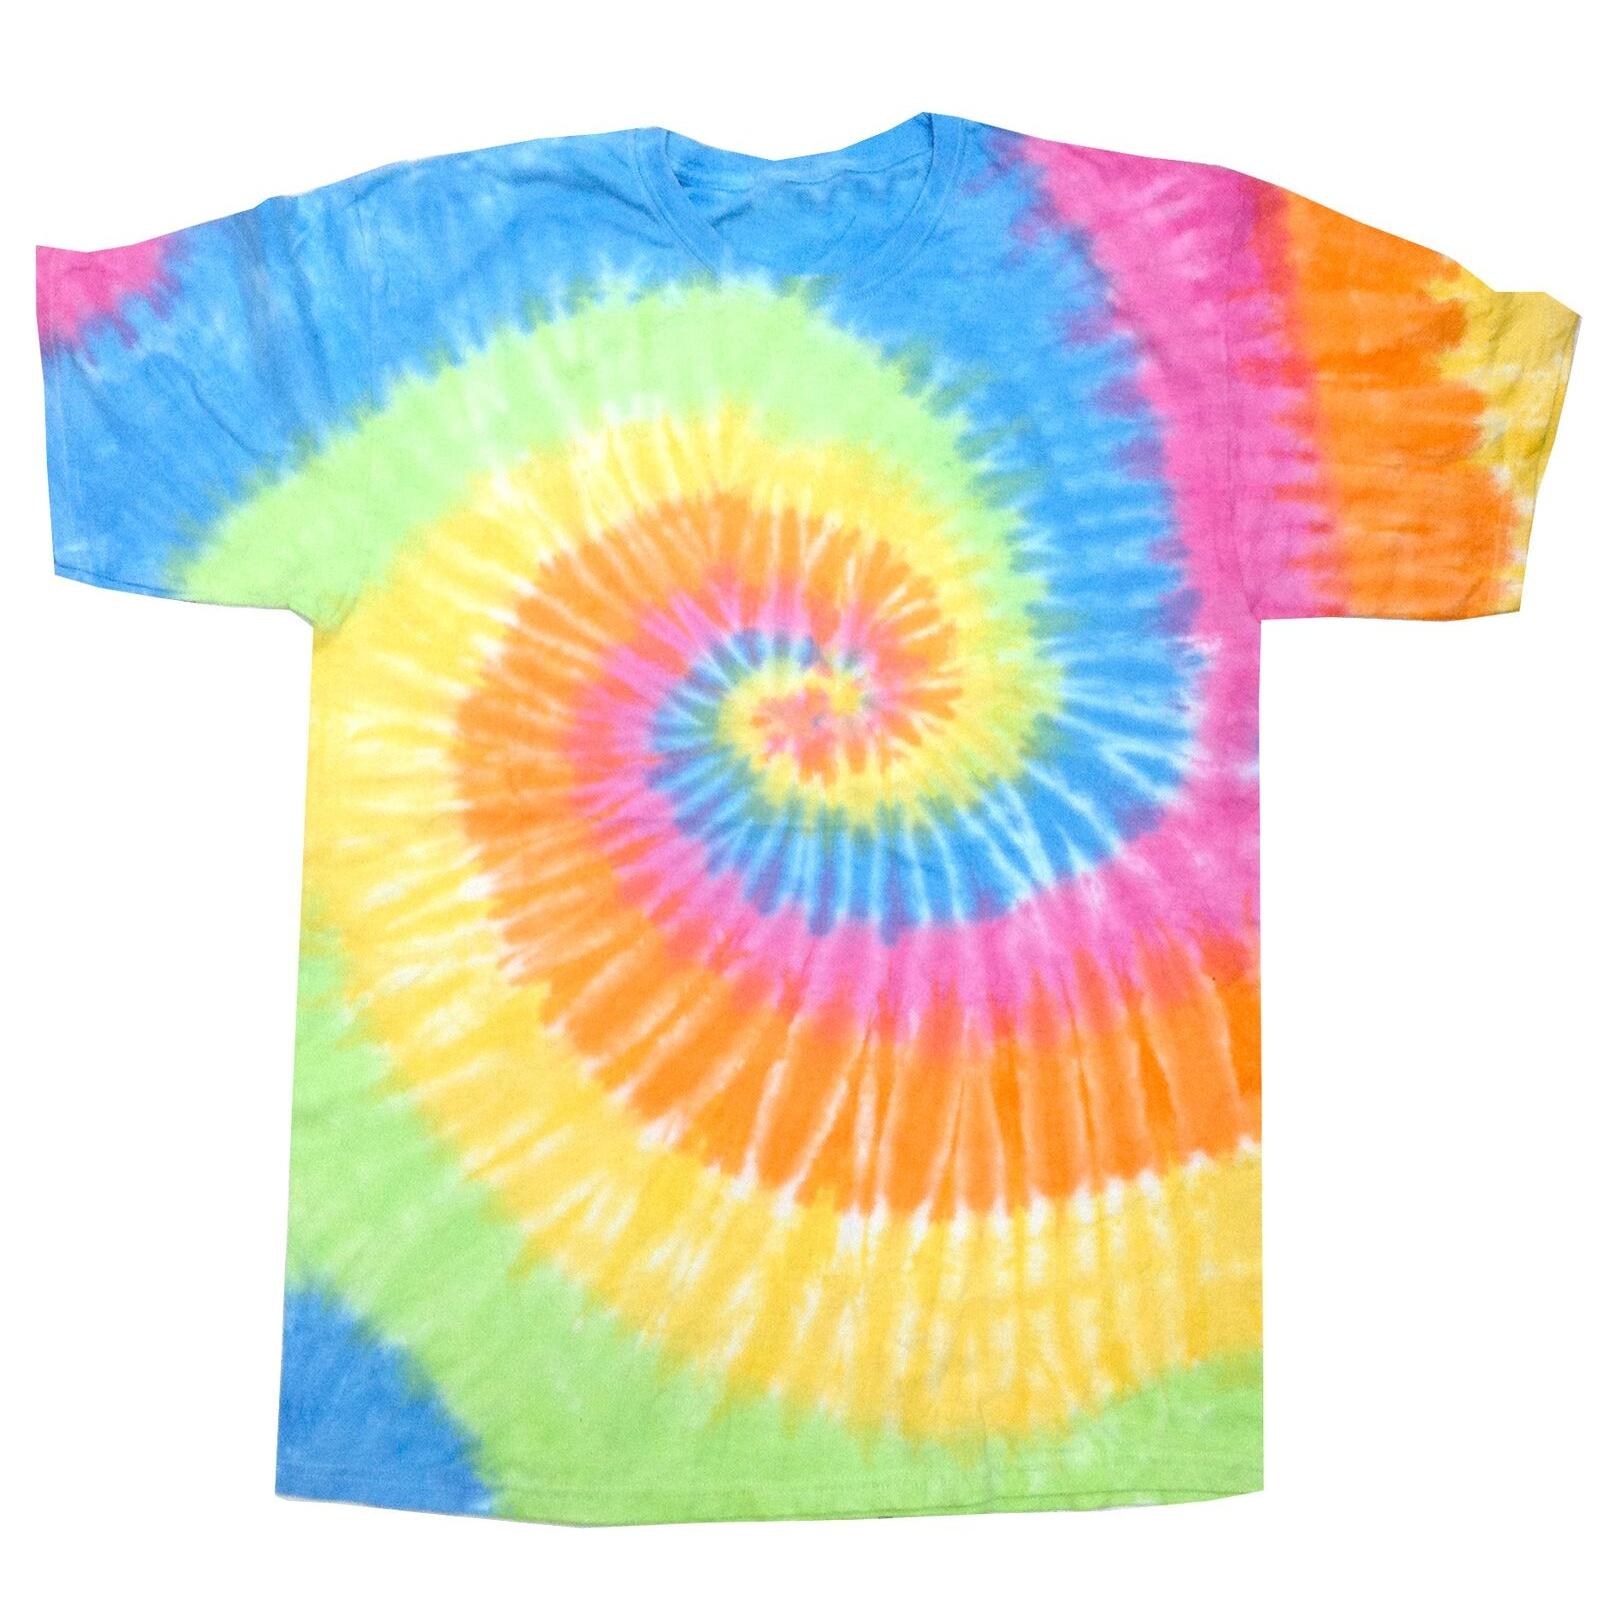 Colortone Womens/Ladies Rainbow Tie-Dye Short Sleeve Heavyweight T-Shirt (2XL) (Blue Jerry)